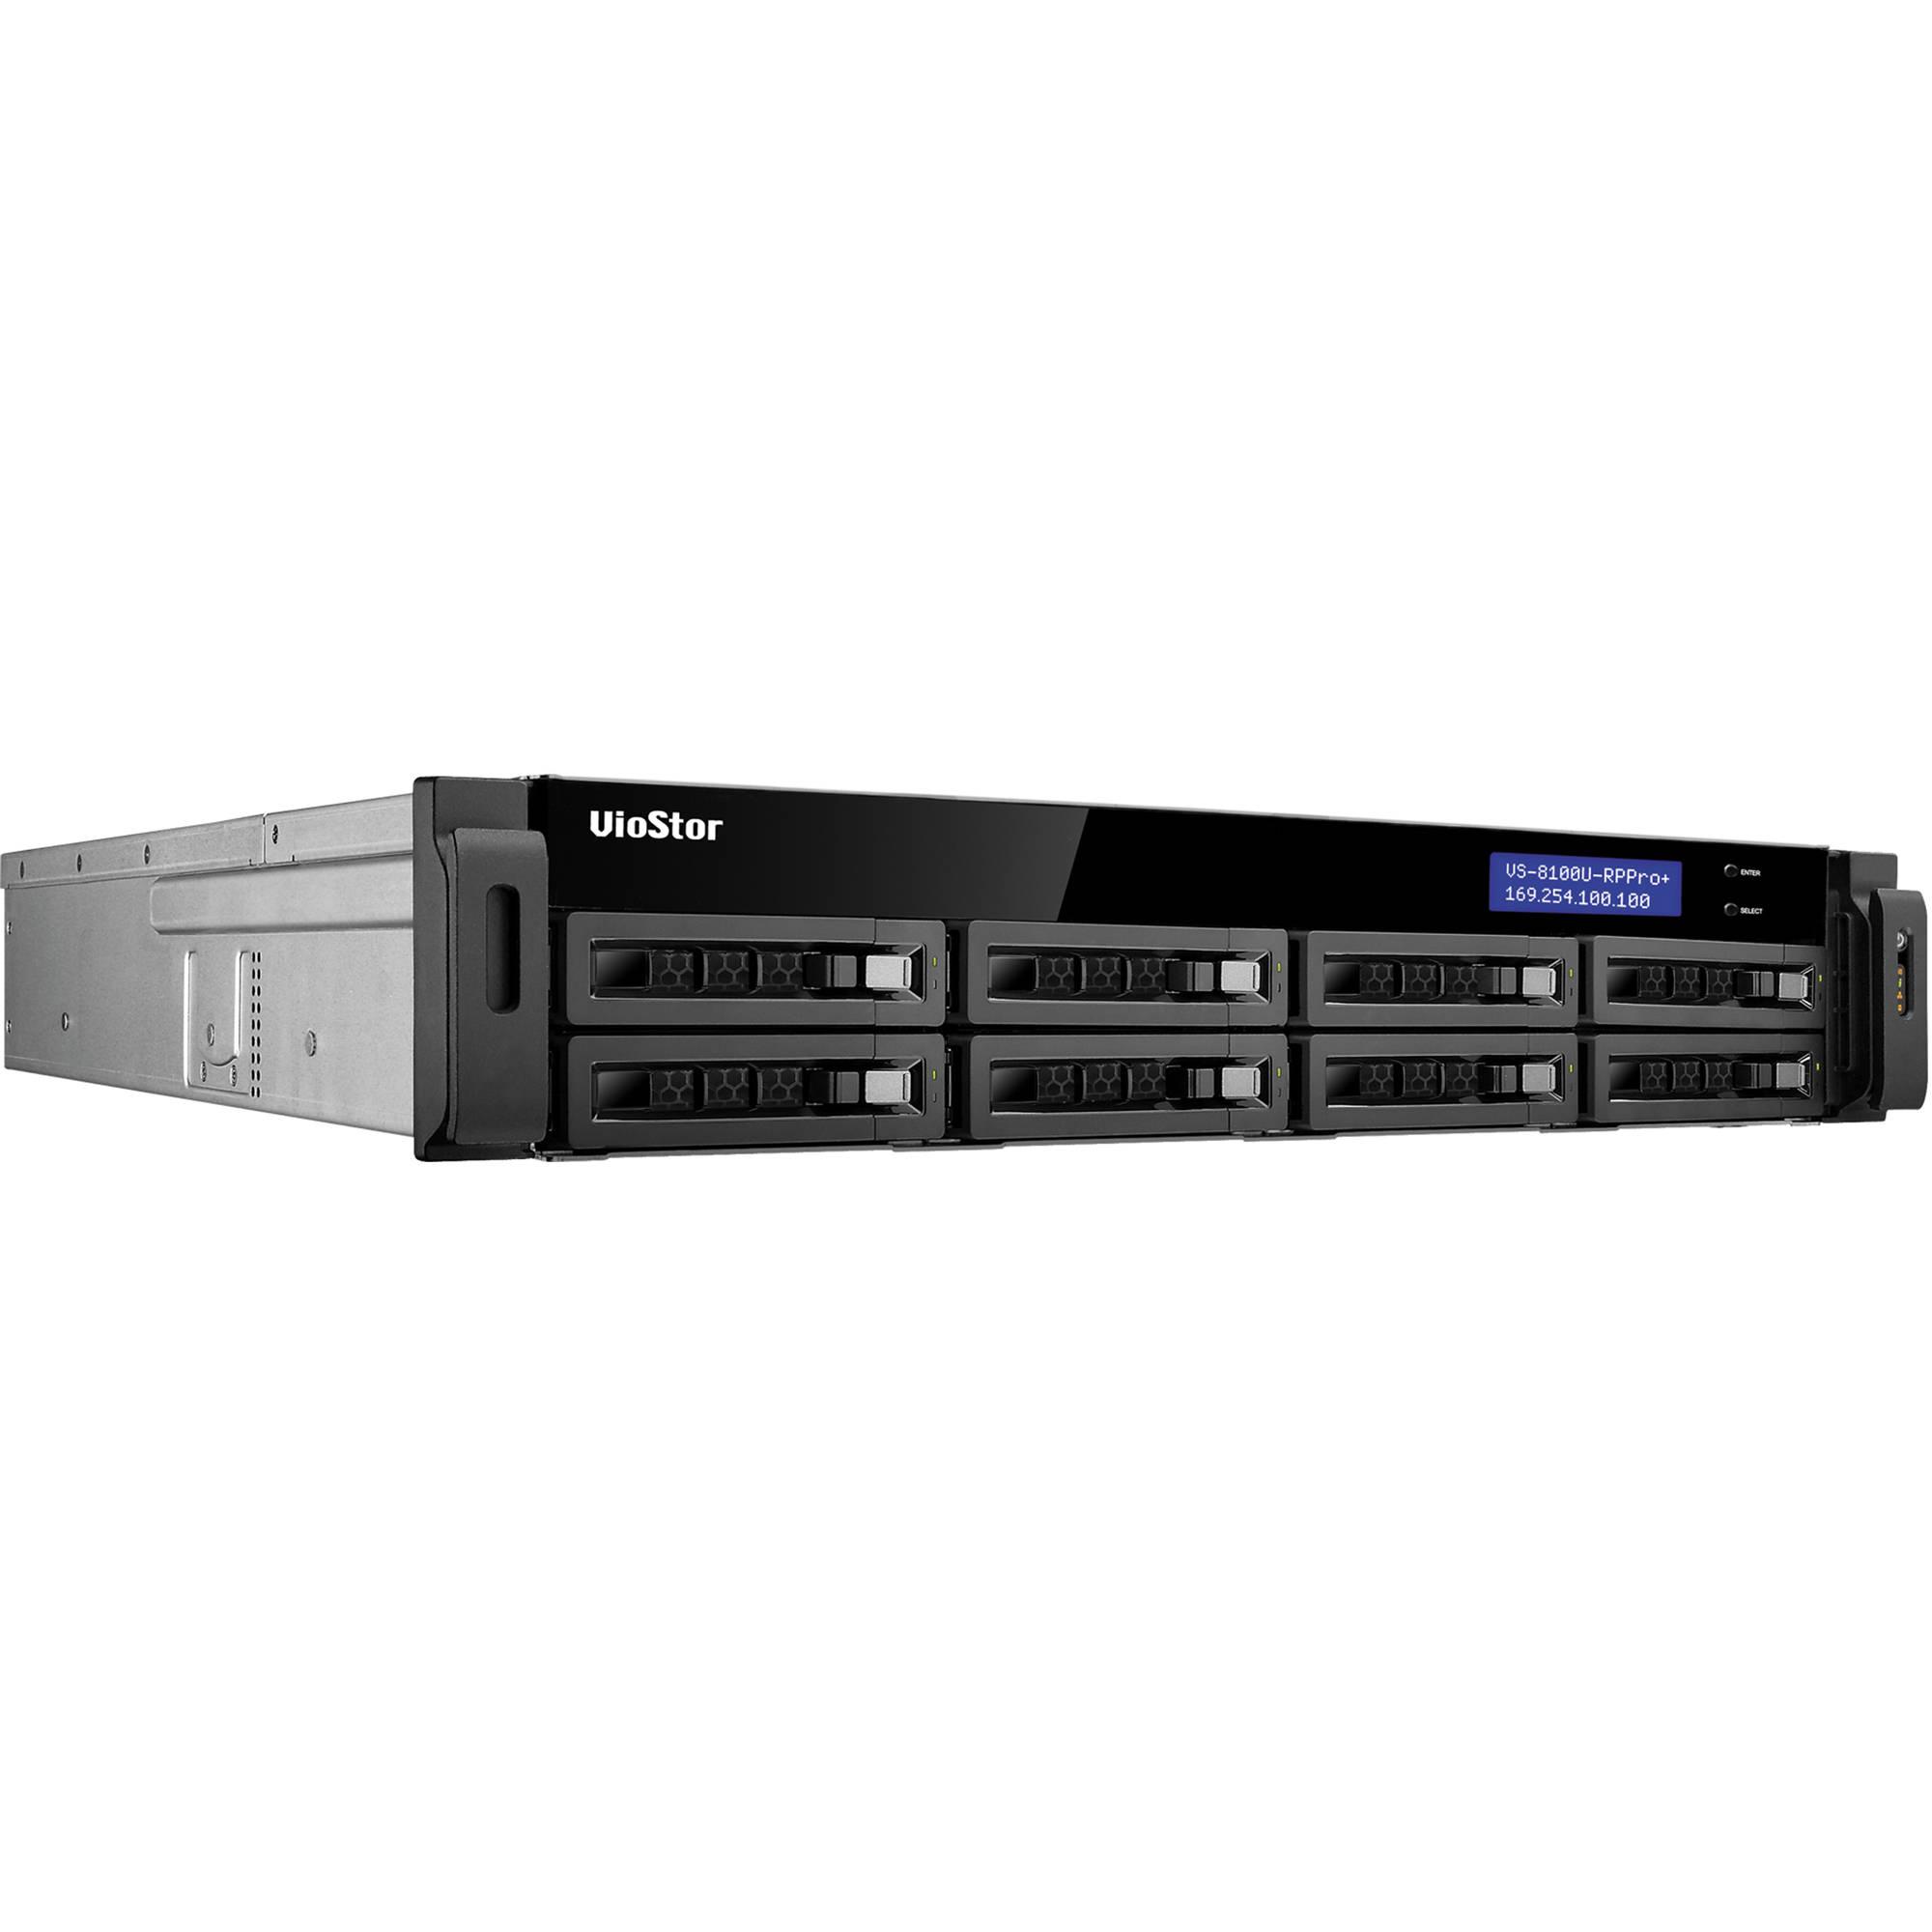 QNAP VS-8140 Pro+ NVR Driver for Windows 10